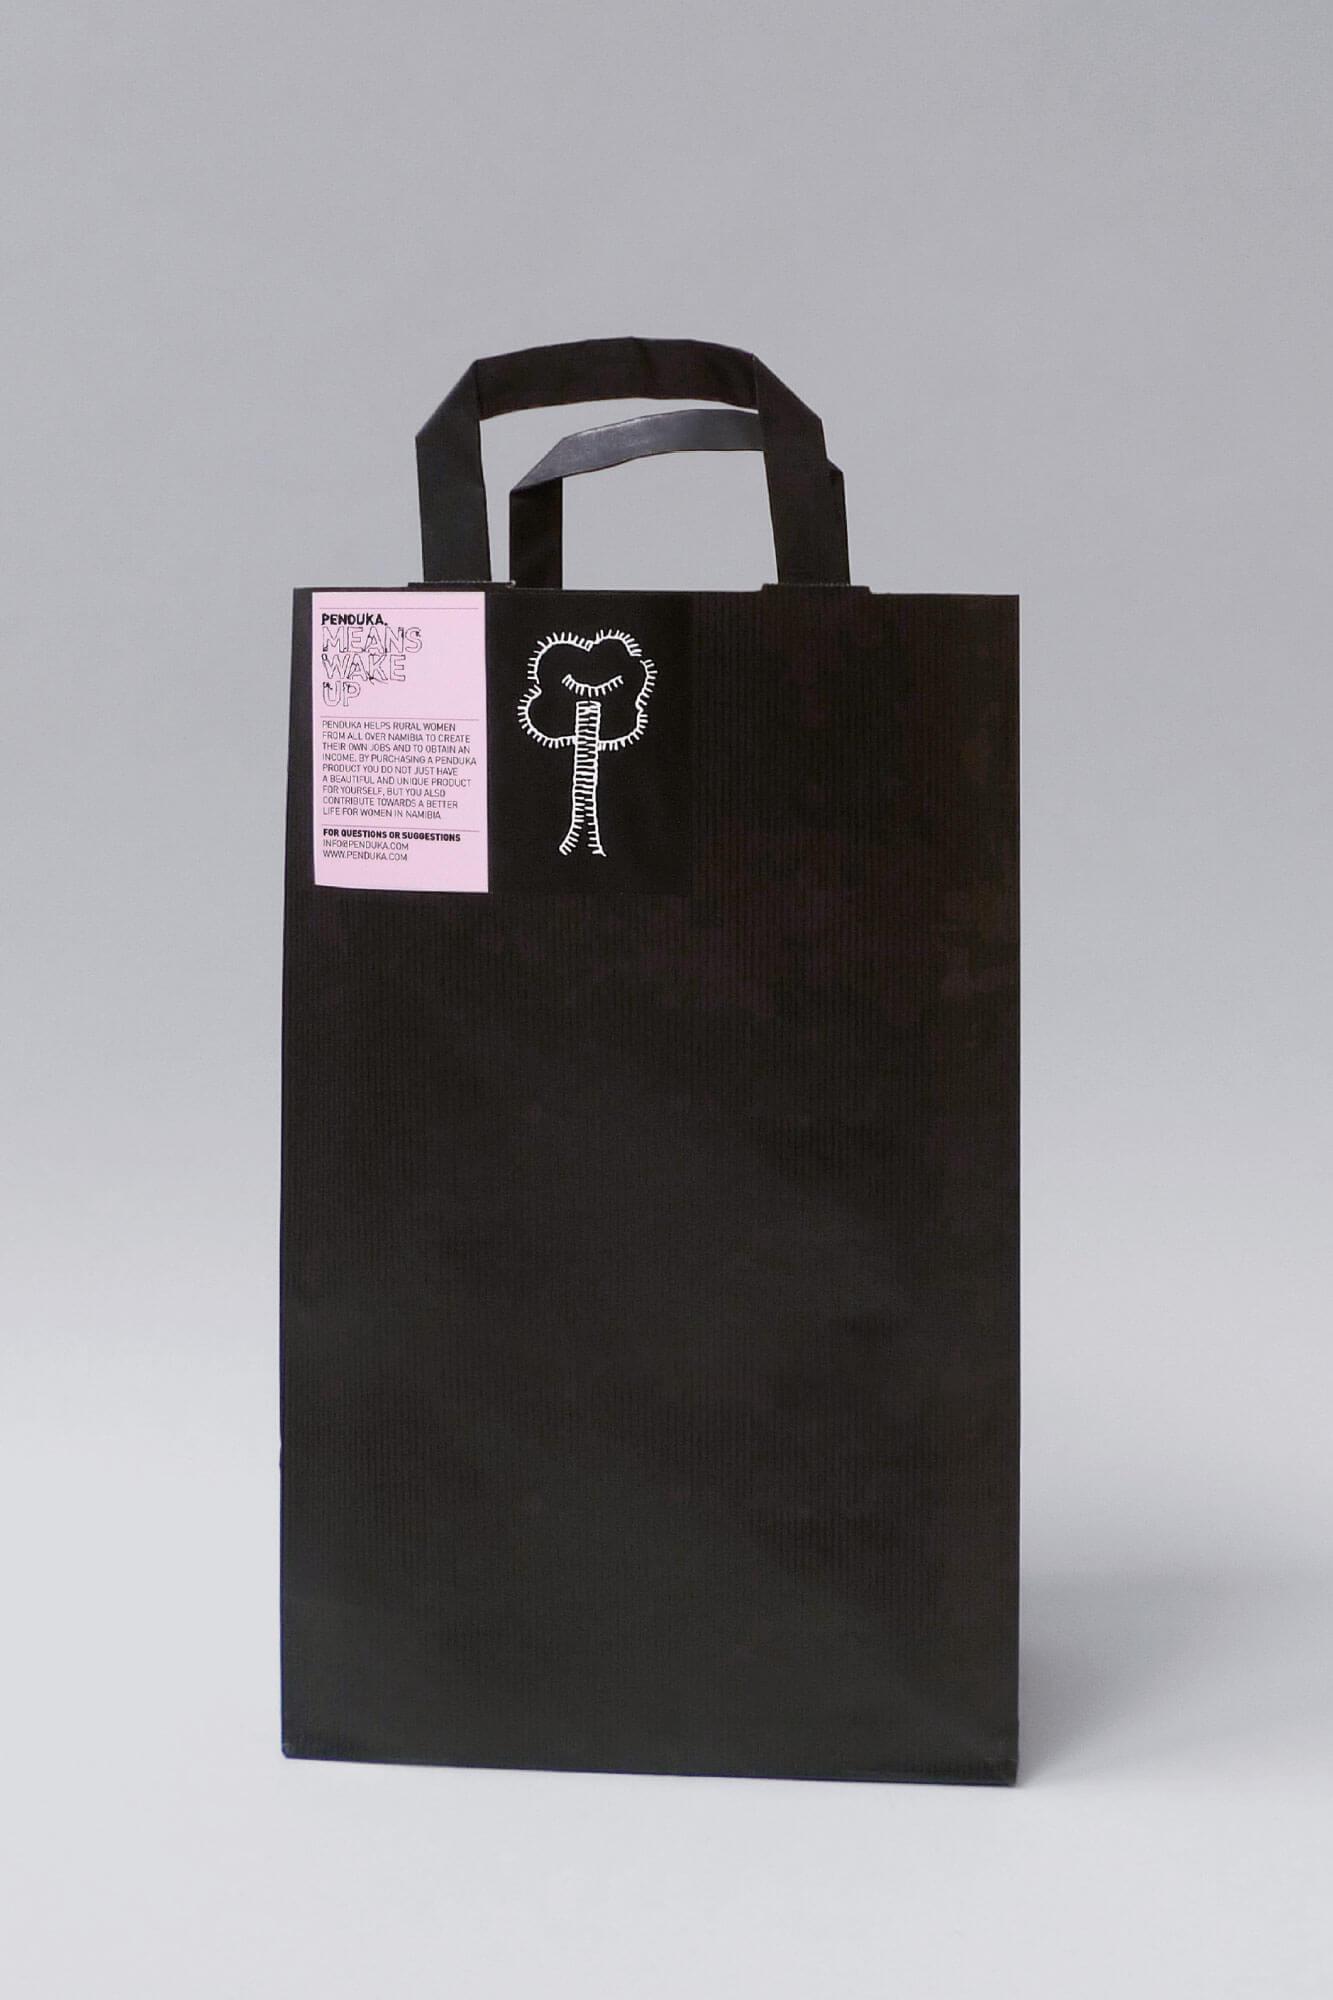 Penduka identity paper bag